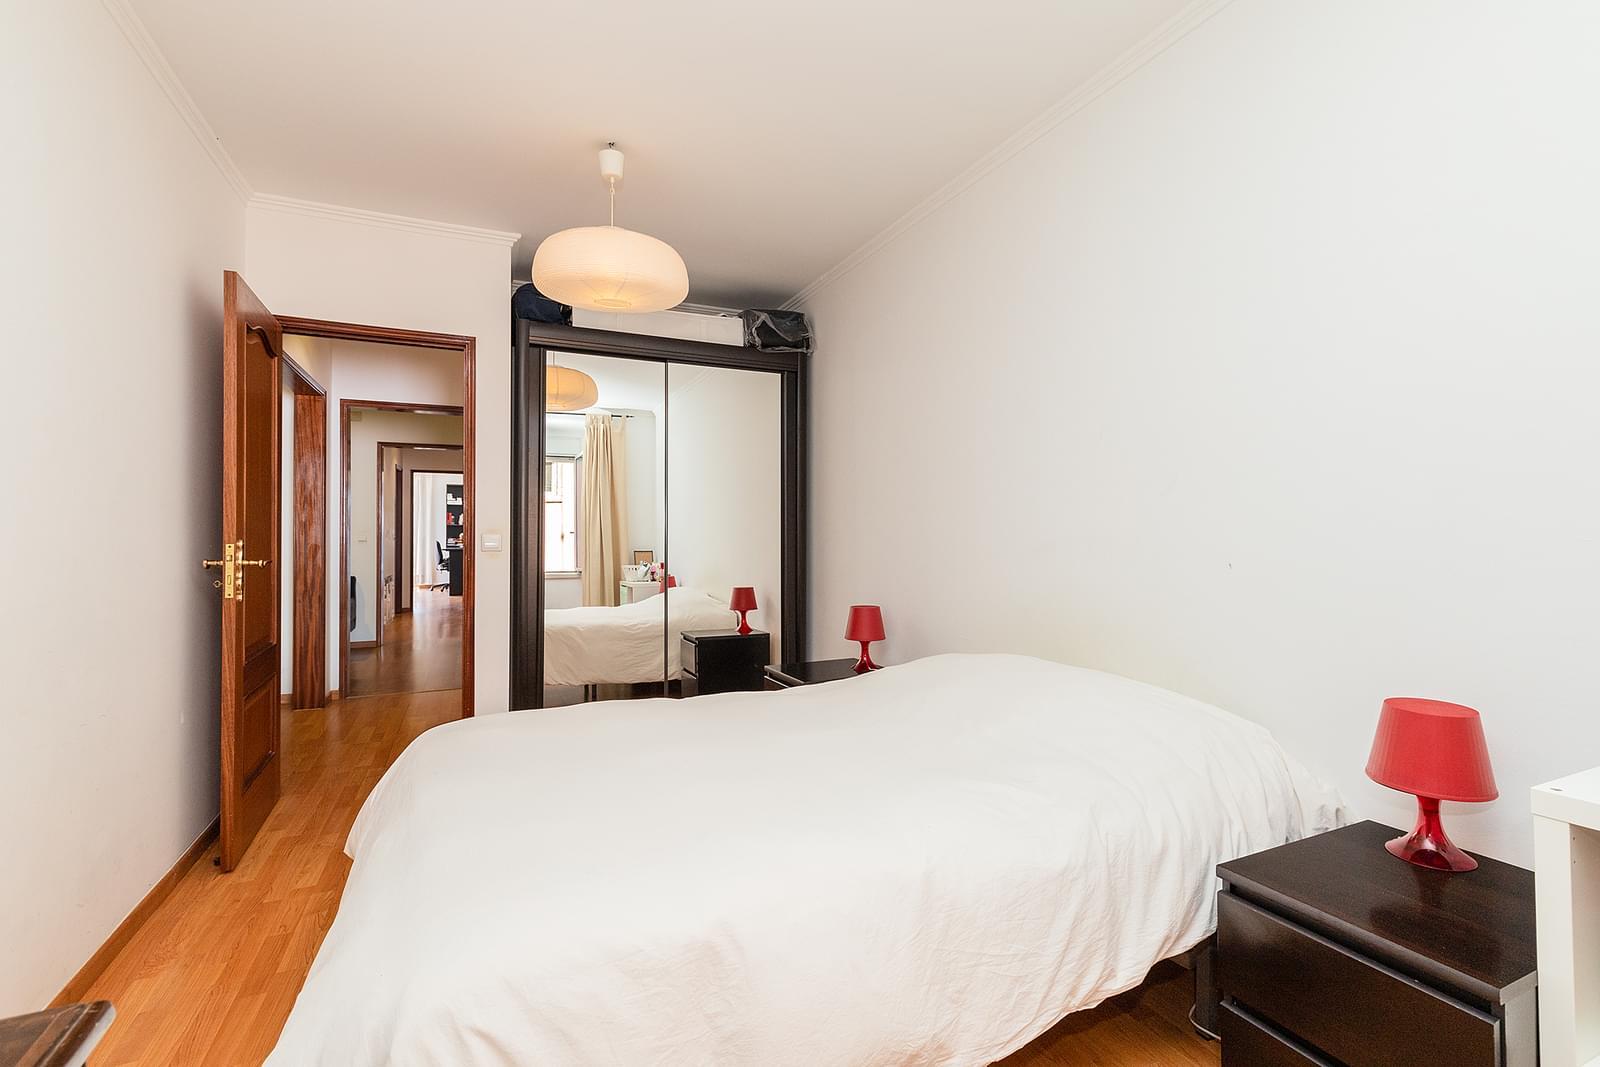 pf17978-apartamento-t3-lisboa-07dd9eff-7654-4c0c-8e57-5c33807a45c4